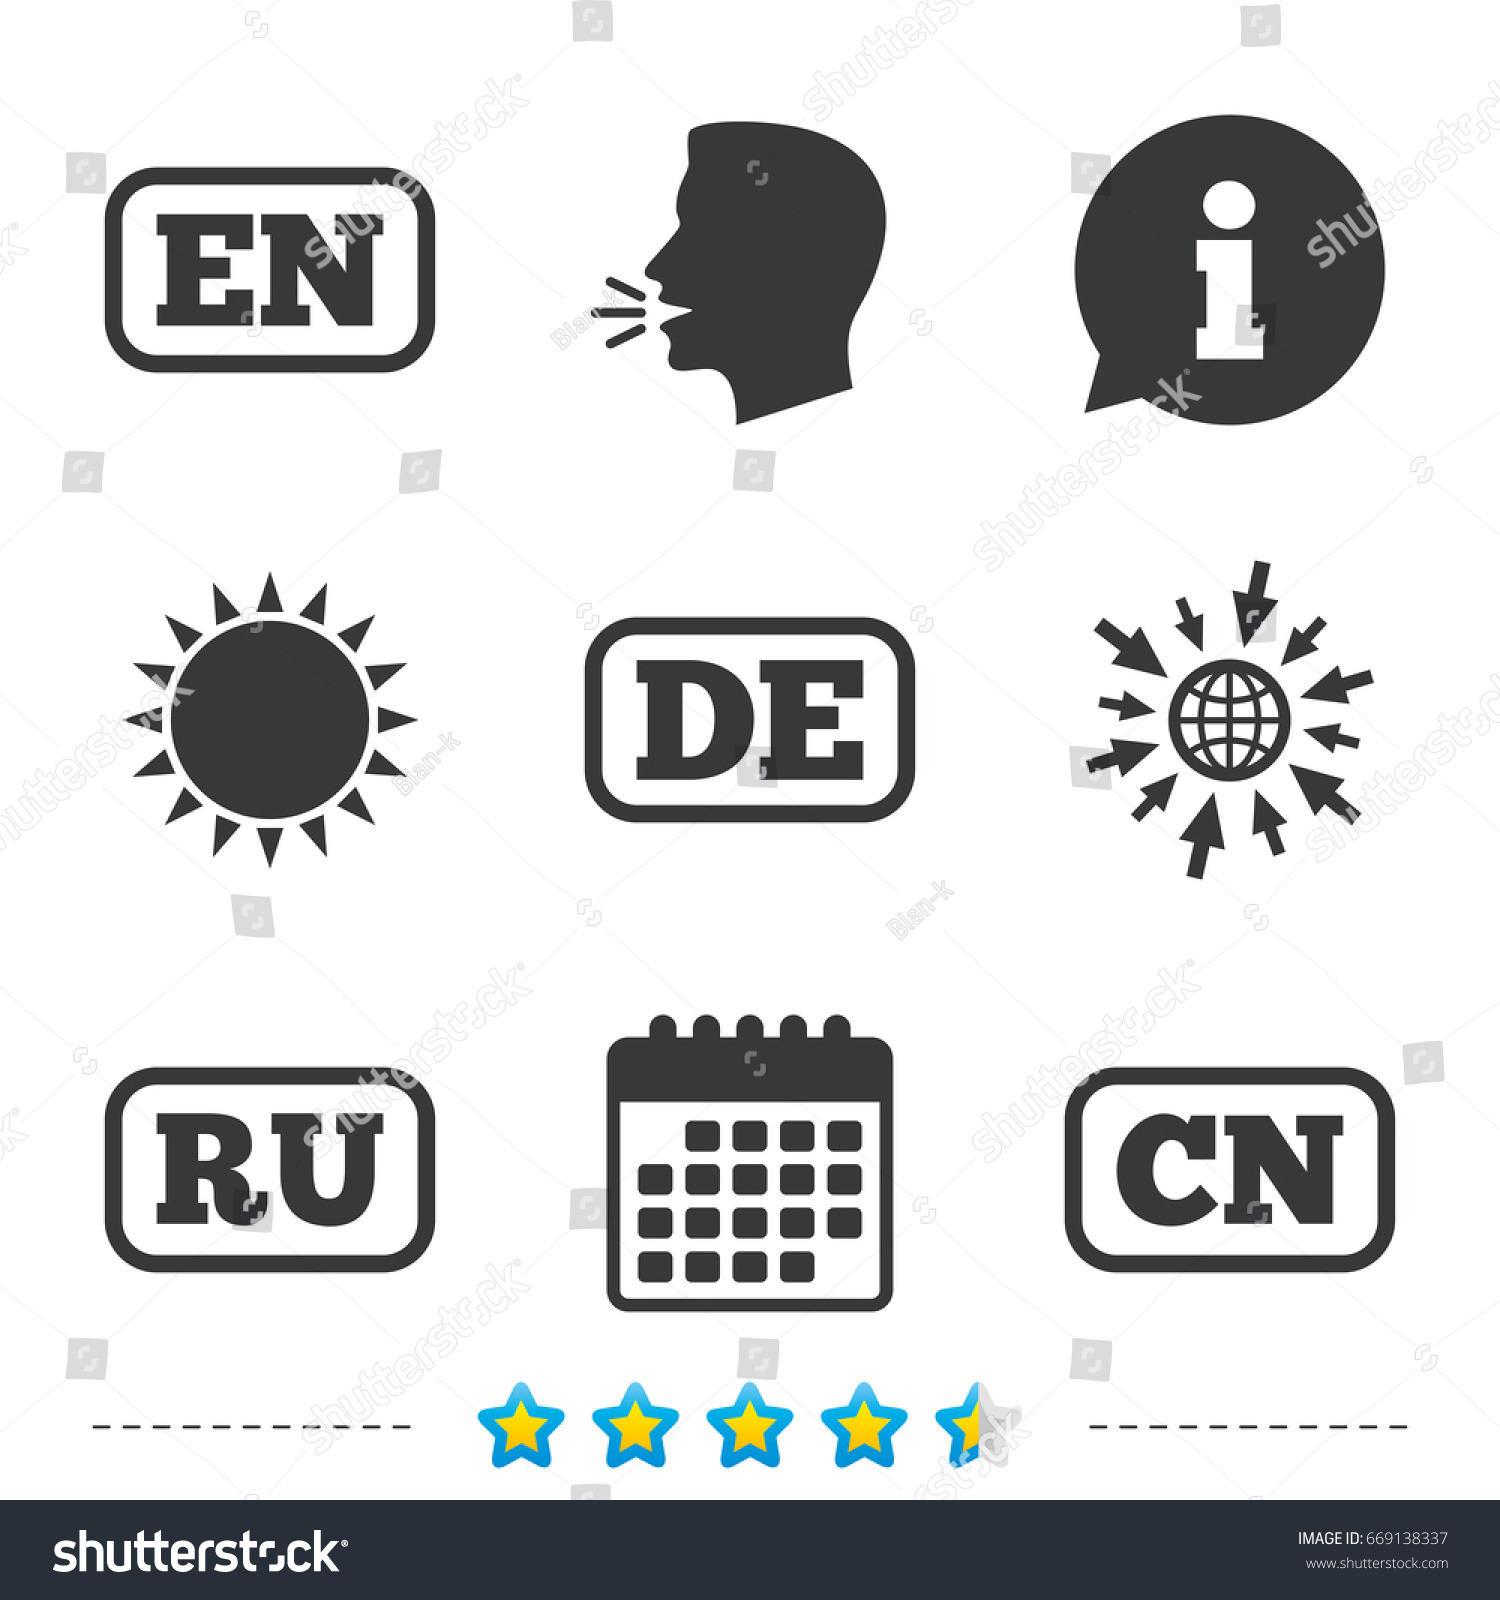 Language icons en de ru cn stock illustration 669138337 shutterstock en de ru and cn translation symbols english german biocorpaavc